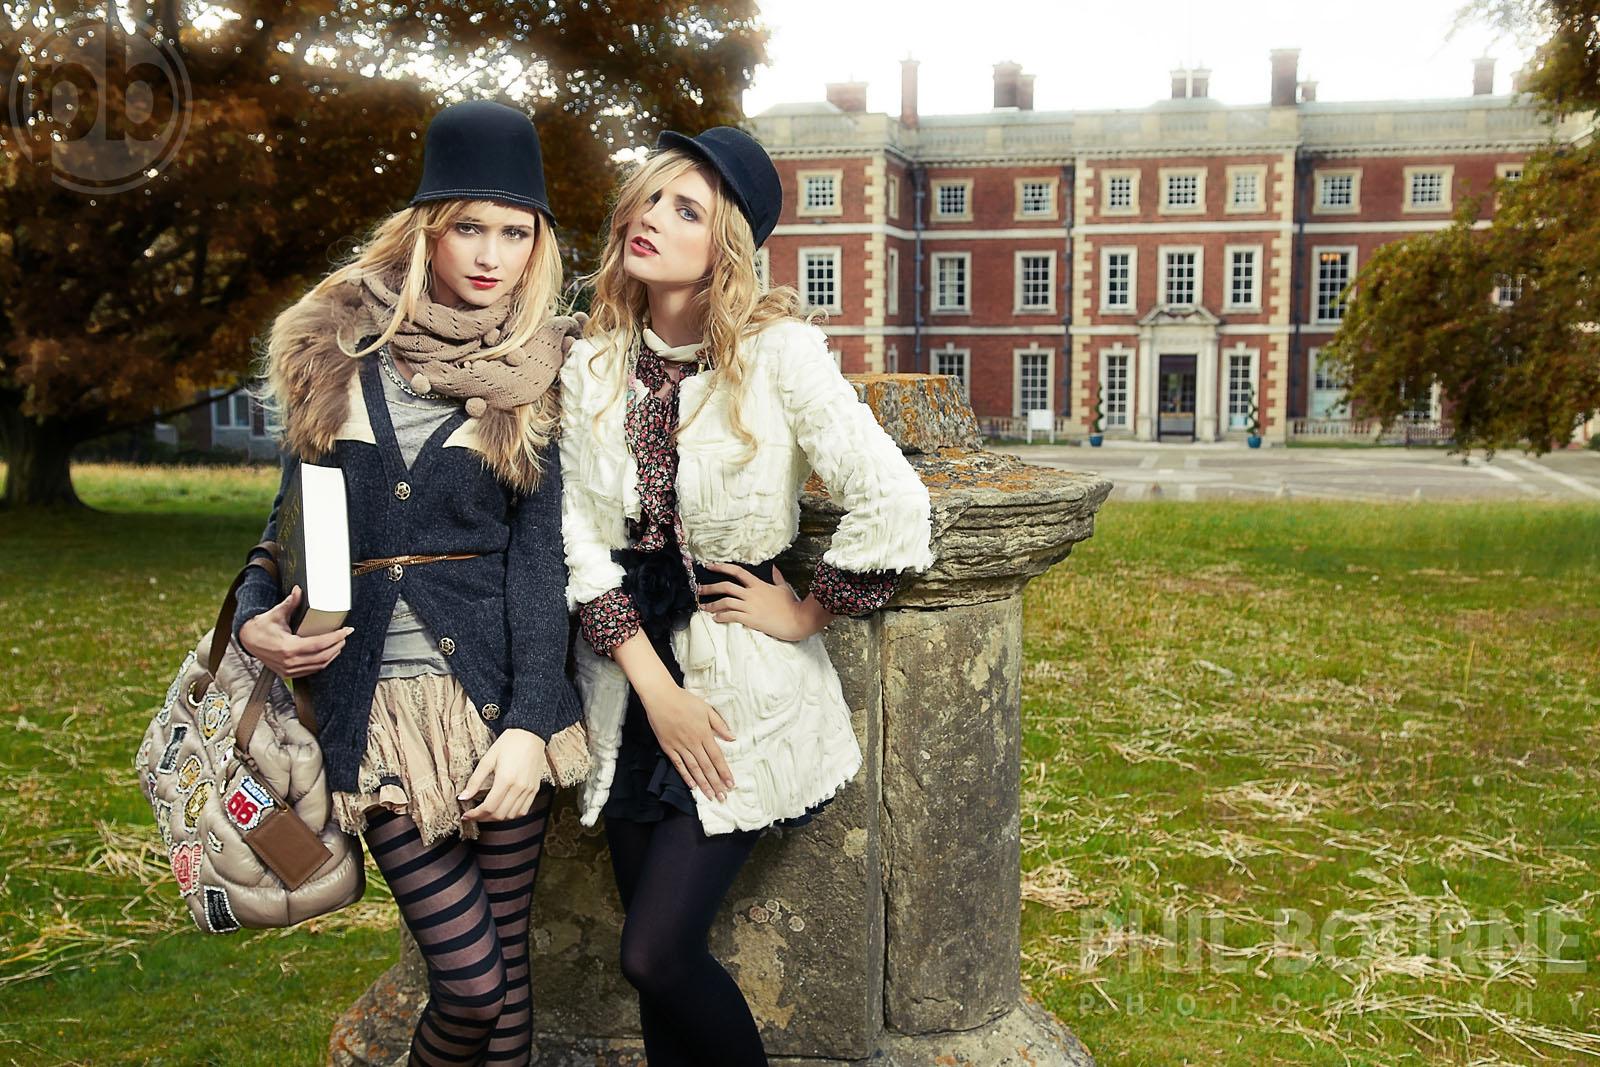 006_London_Fashion_Photographer_009.jpg